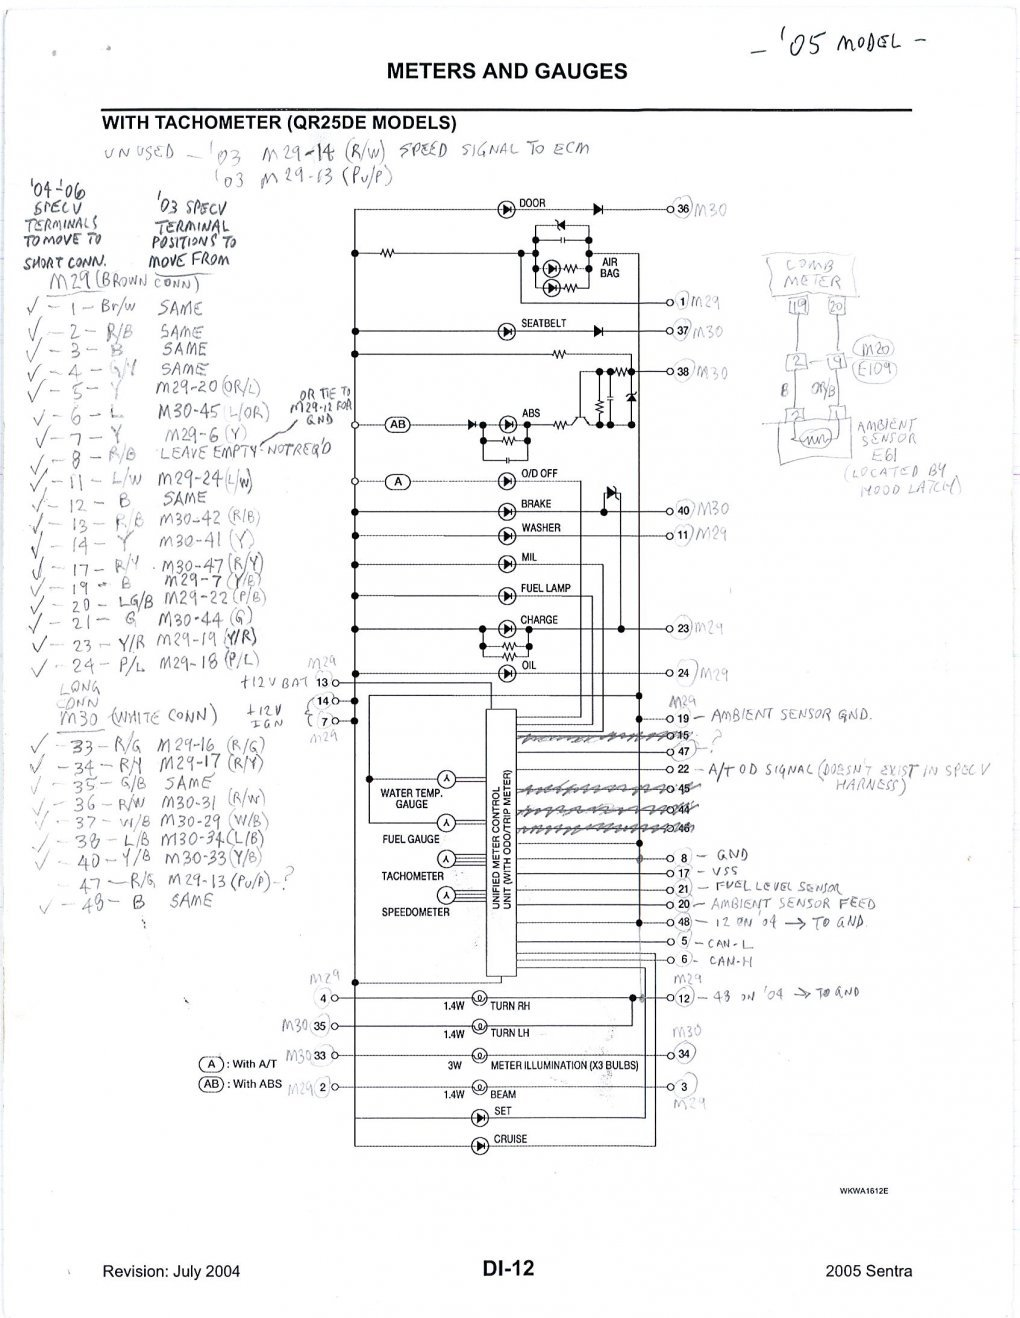 2006 nissan sentra se r spec v wiring diagram wiring diagram 2003 nissan sentra se r wiring diagram diagrams